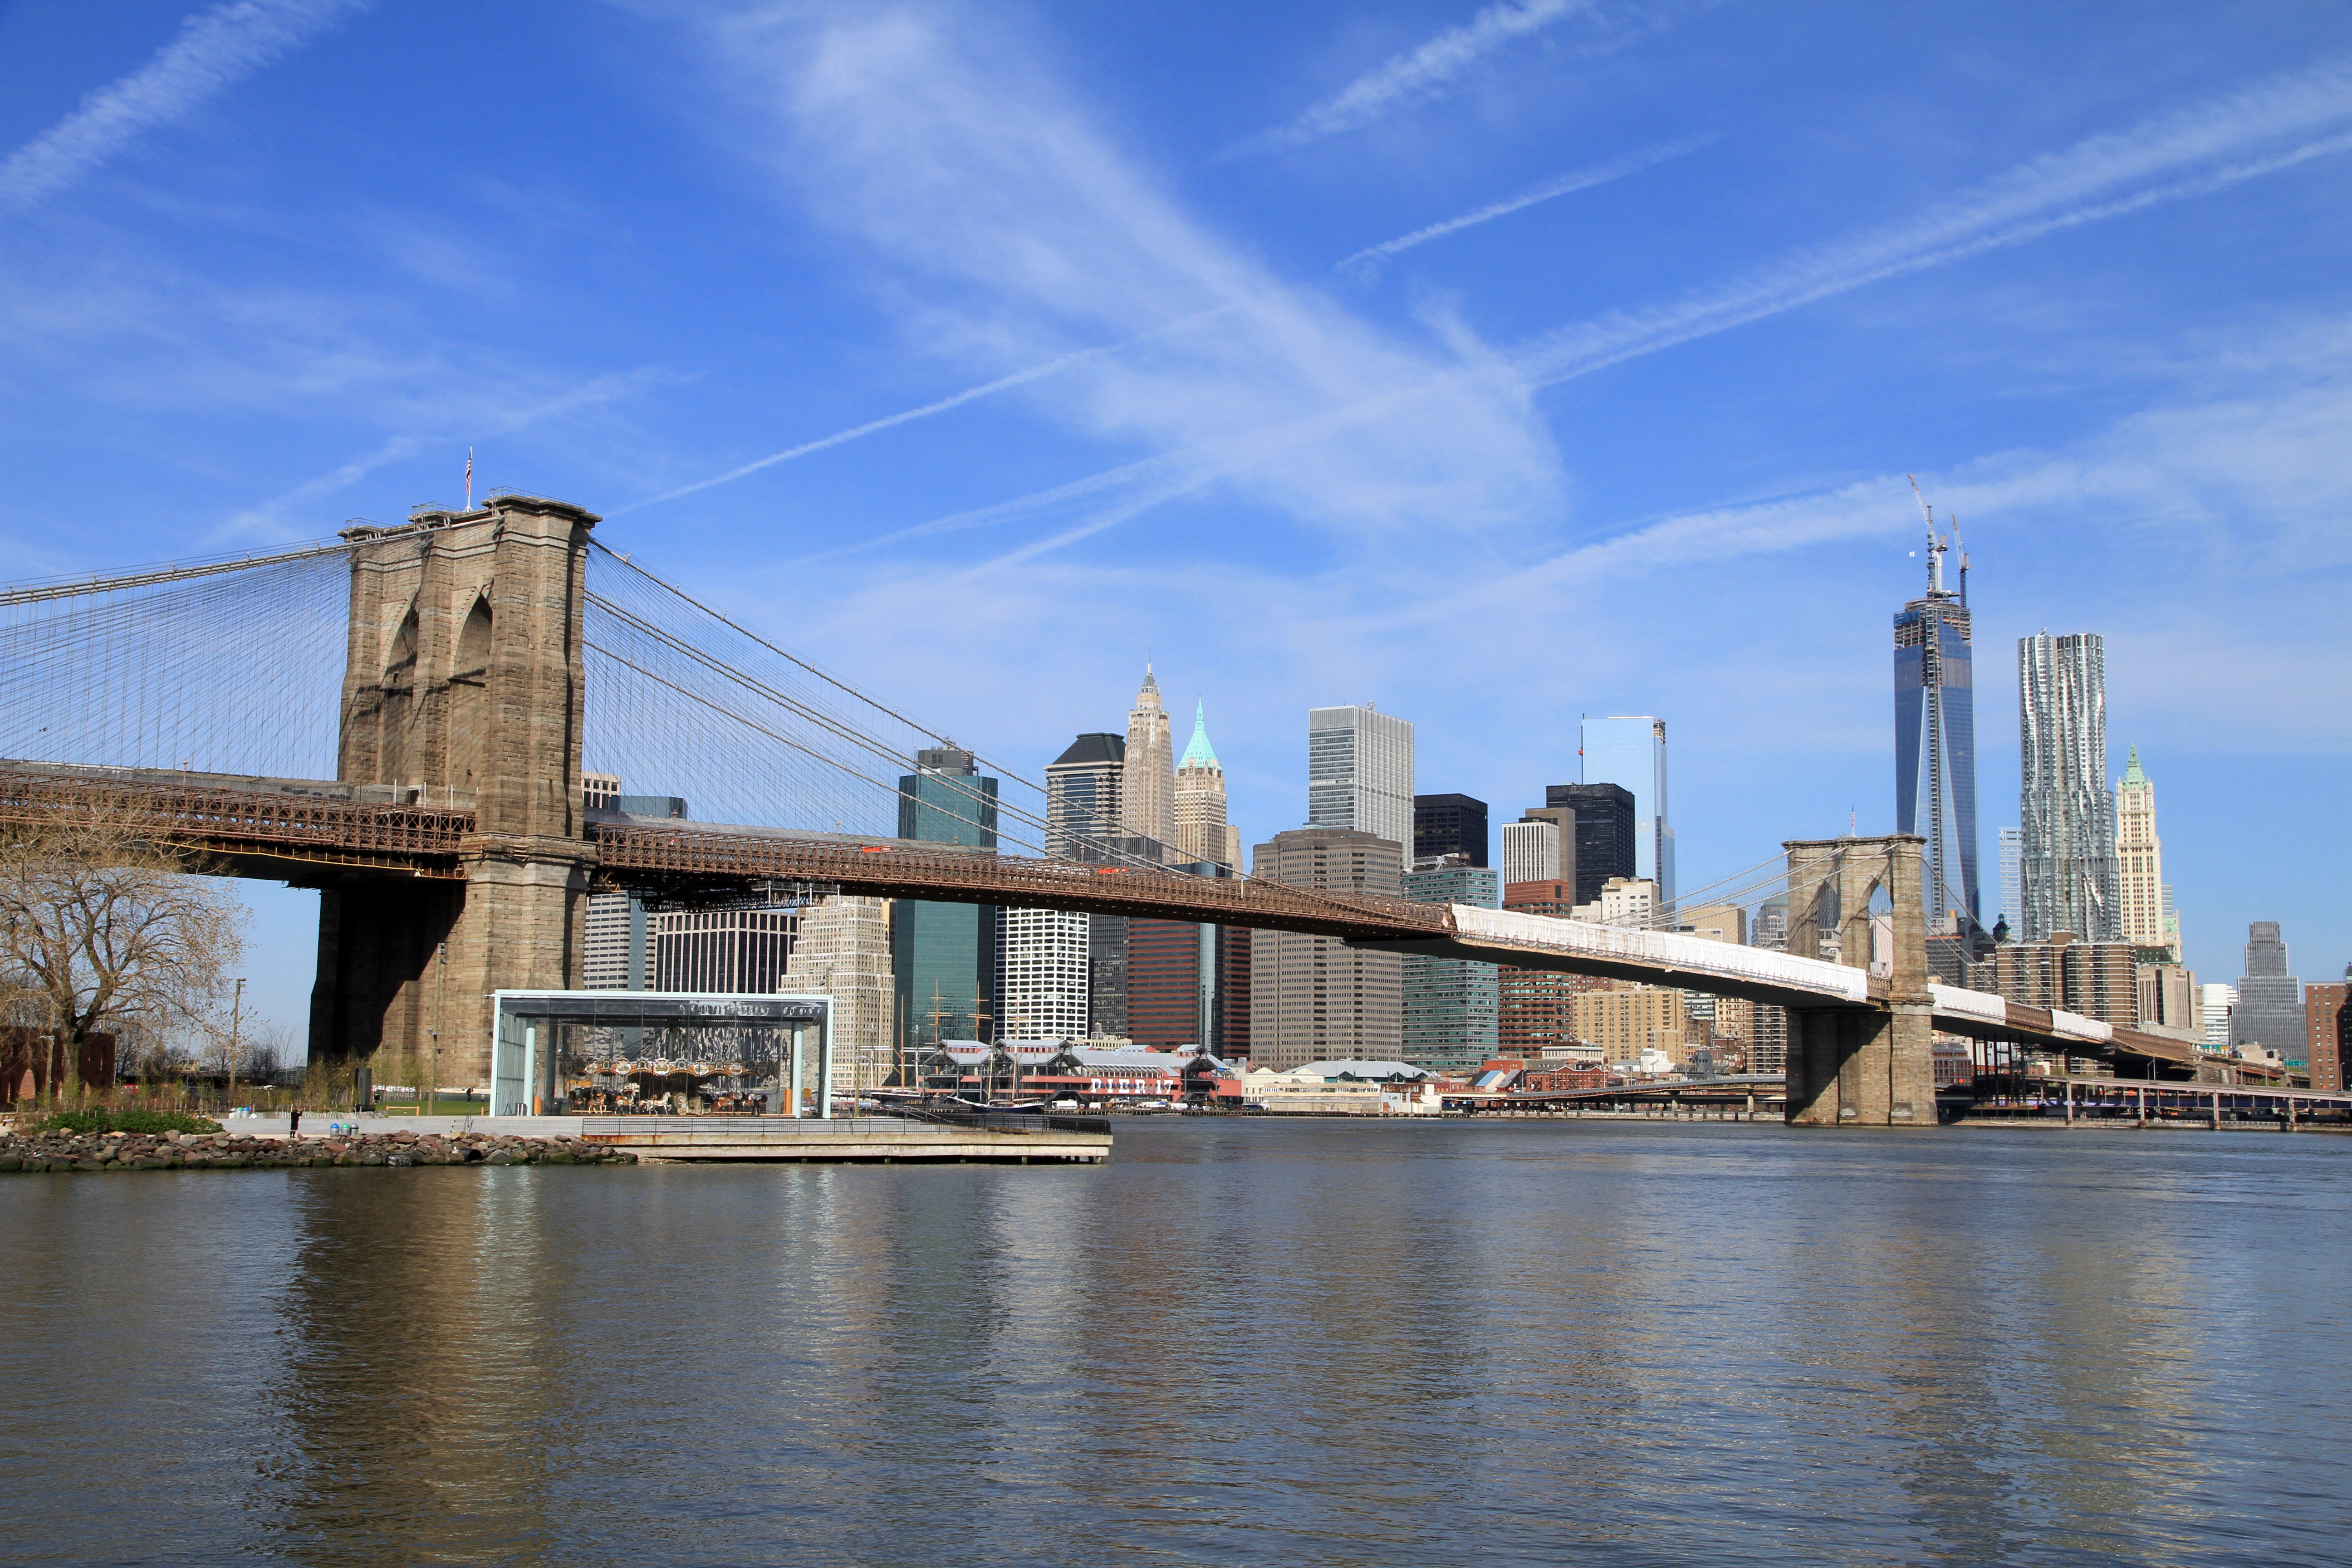 File:USA-NYC-Brooklyn Bridge.jpg - Wikimedia Commons